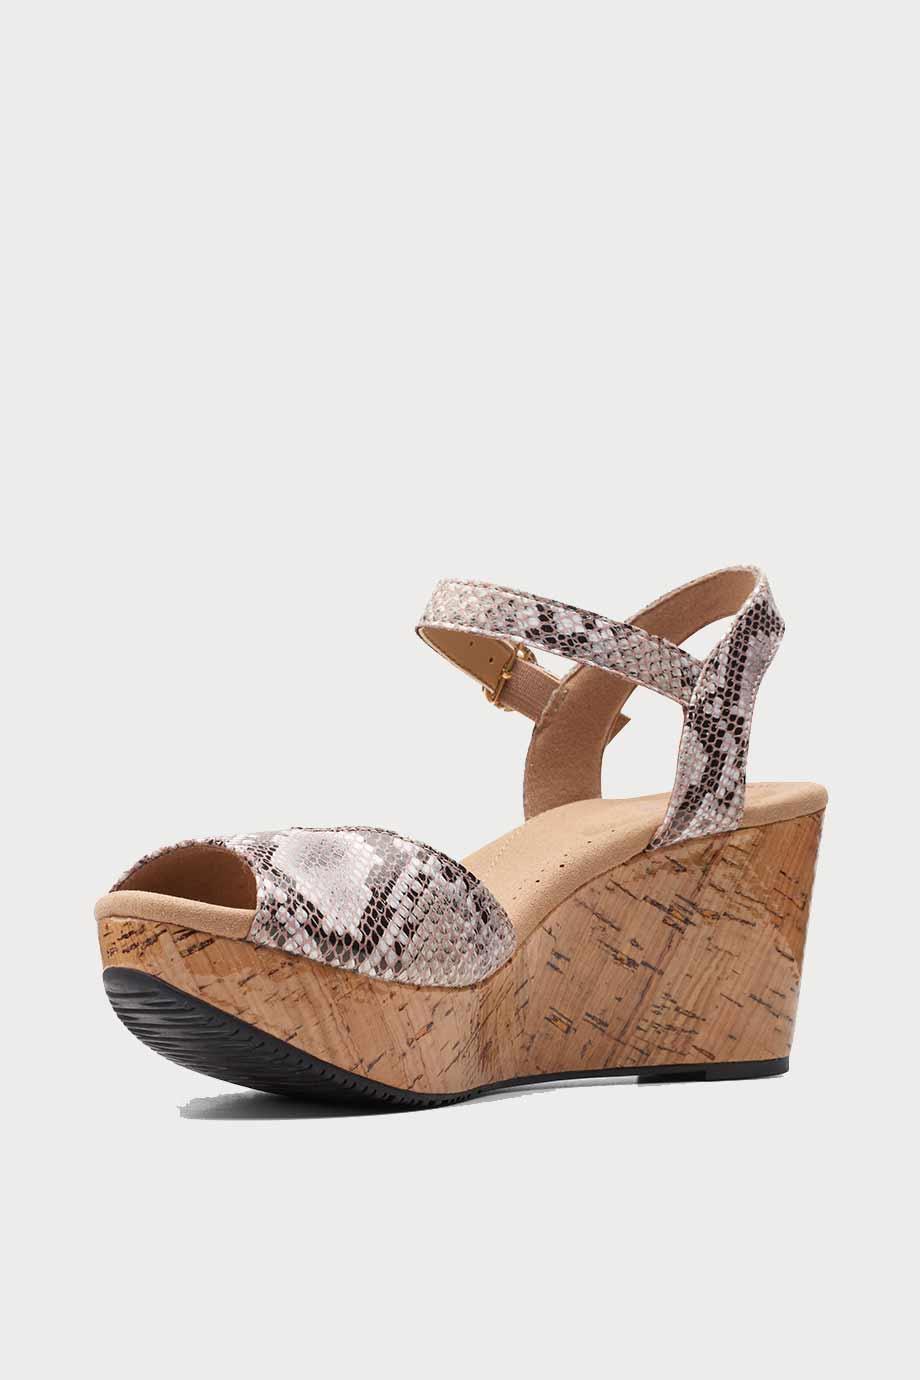 spiridoula metheniti shoes xalkida Annadel Mystic clarks natural snake 4